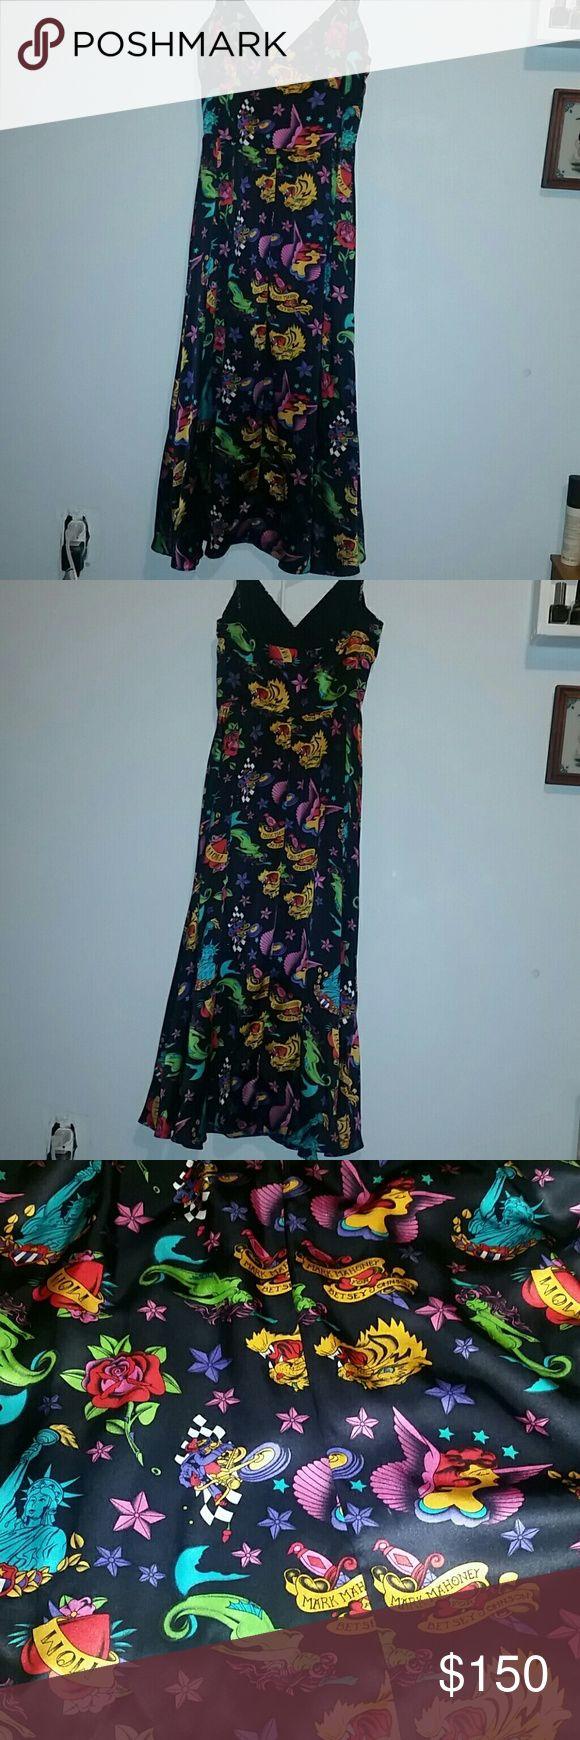 206 best My Posh Picks images on Pinterest | Ball gown, Ballroom ...